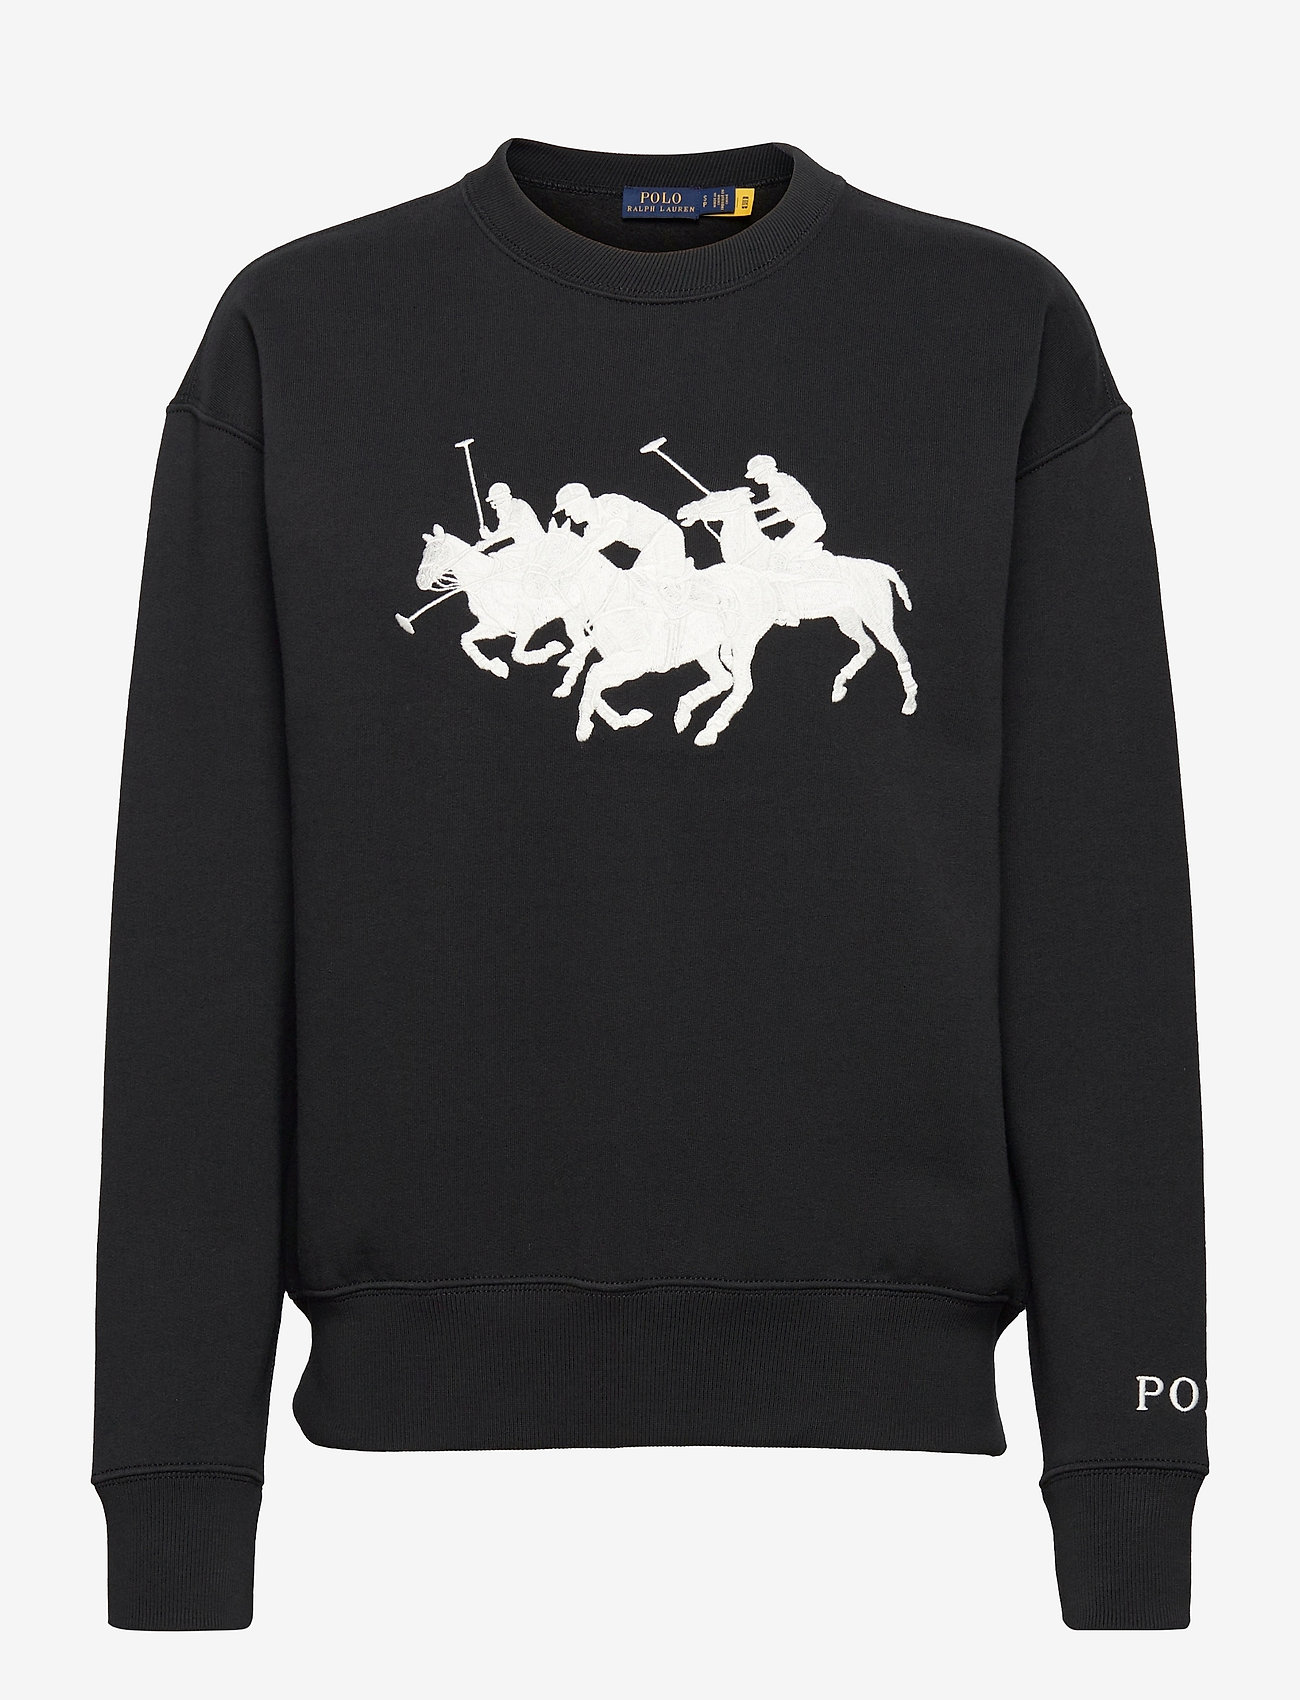 Polo Ralph Lauren - HEARD CN PO-LONG SLEEVE-KNIT - sweatshirts - polo black - 0